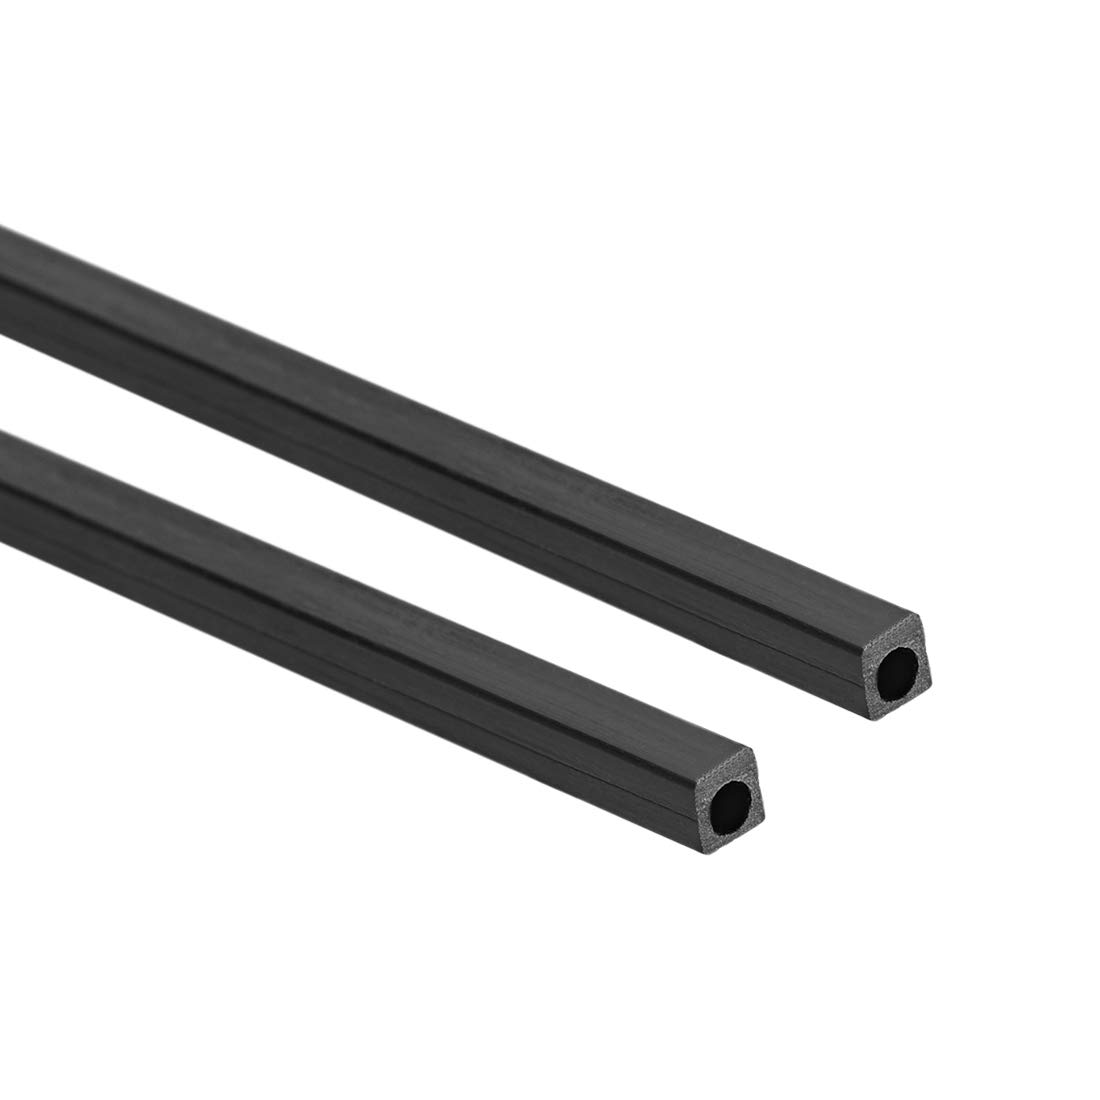 Carbon Fiber Round Tube 3mm x 2mm x 400mm Carbon Fiber Pultrusion Tubing 3 Pcs